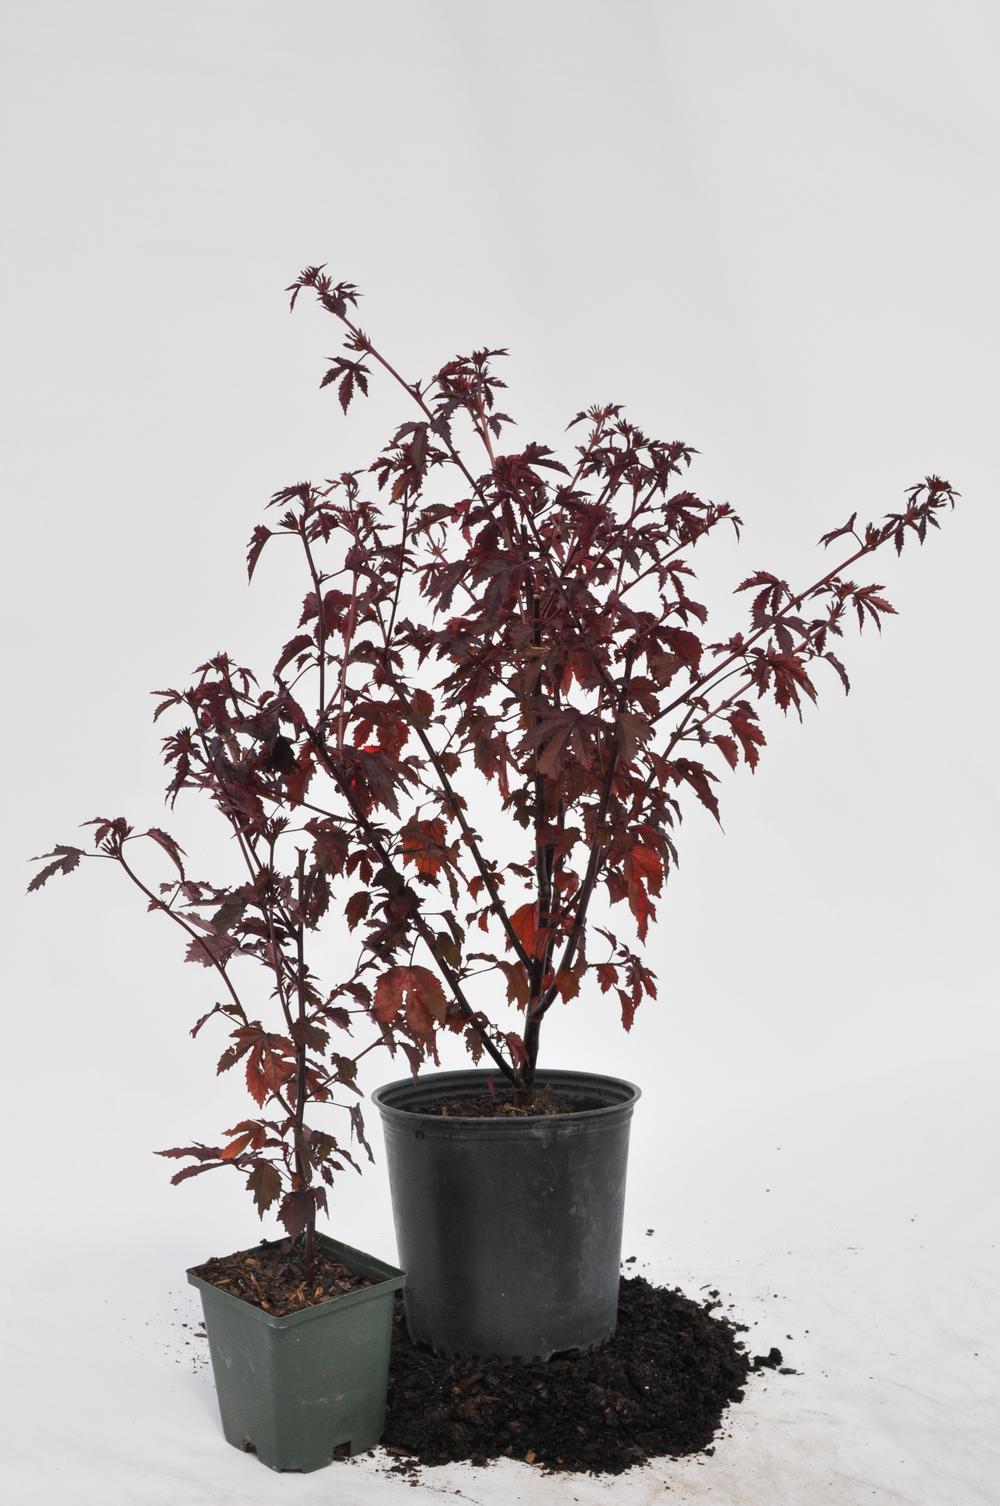 cranberry hibiscus-432.jpg